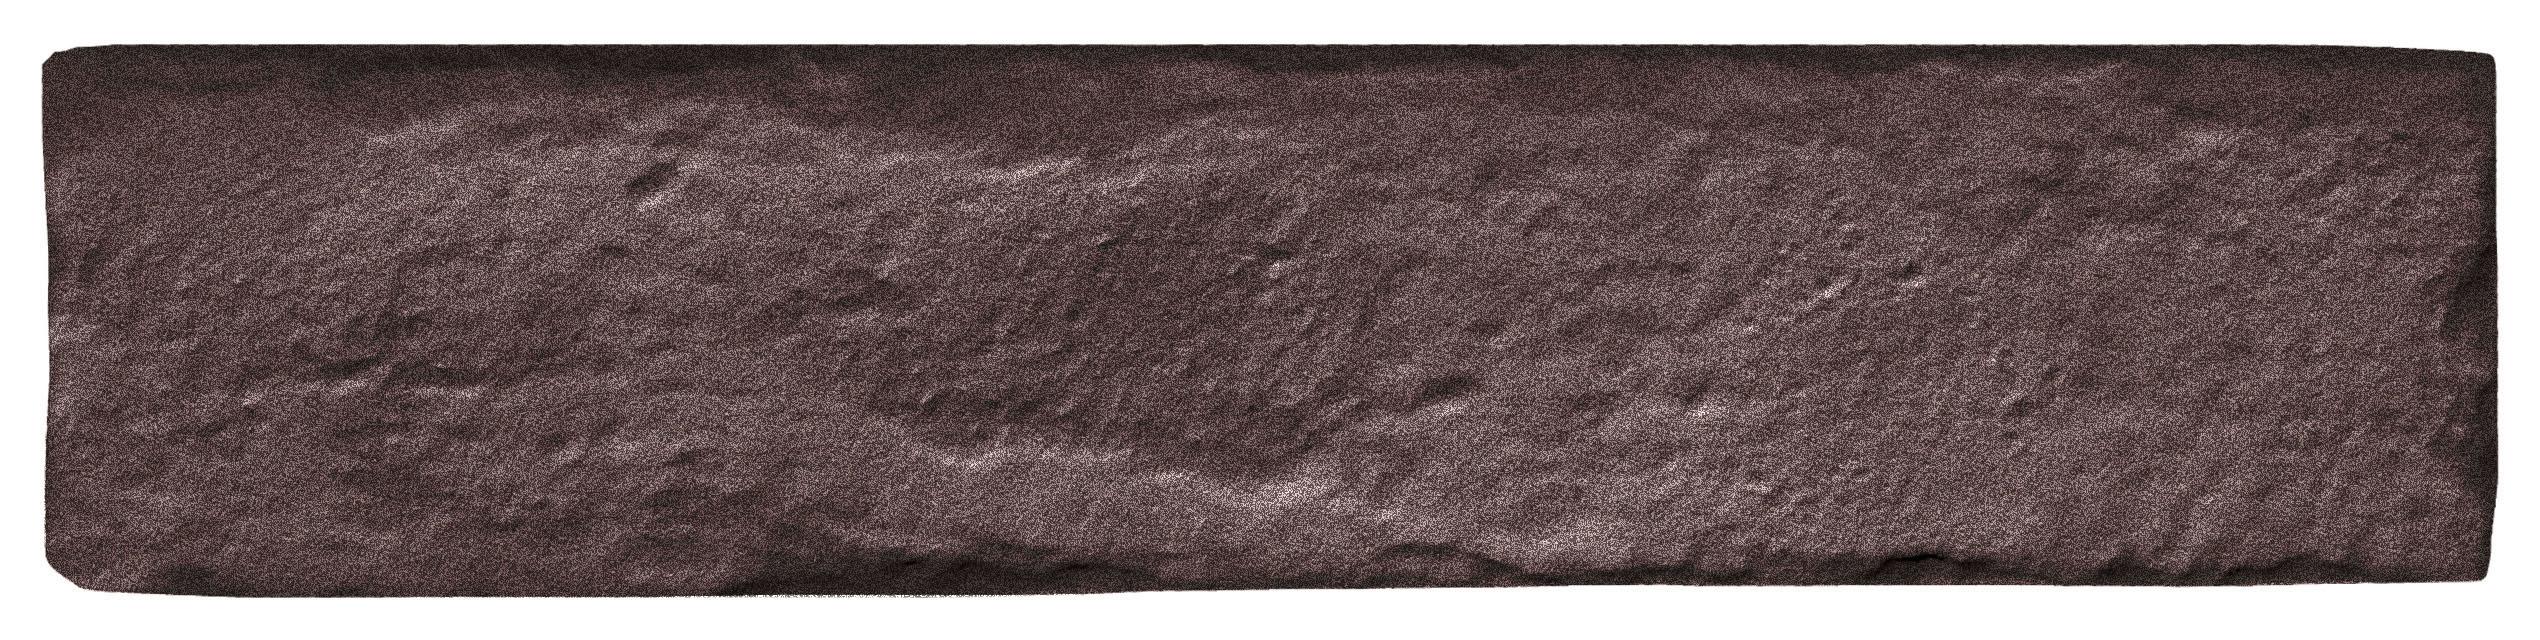 Купить термопанели Brickstyle The Strand Black